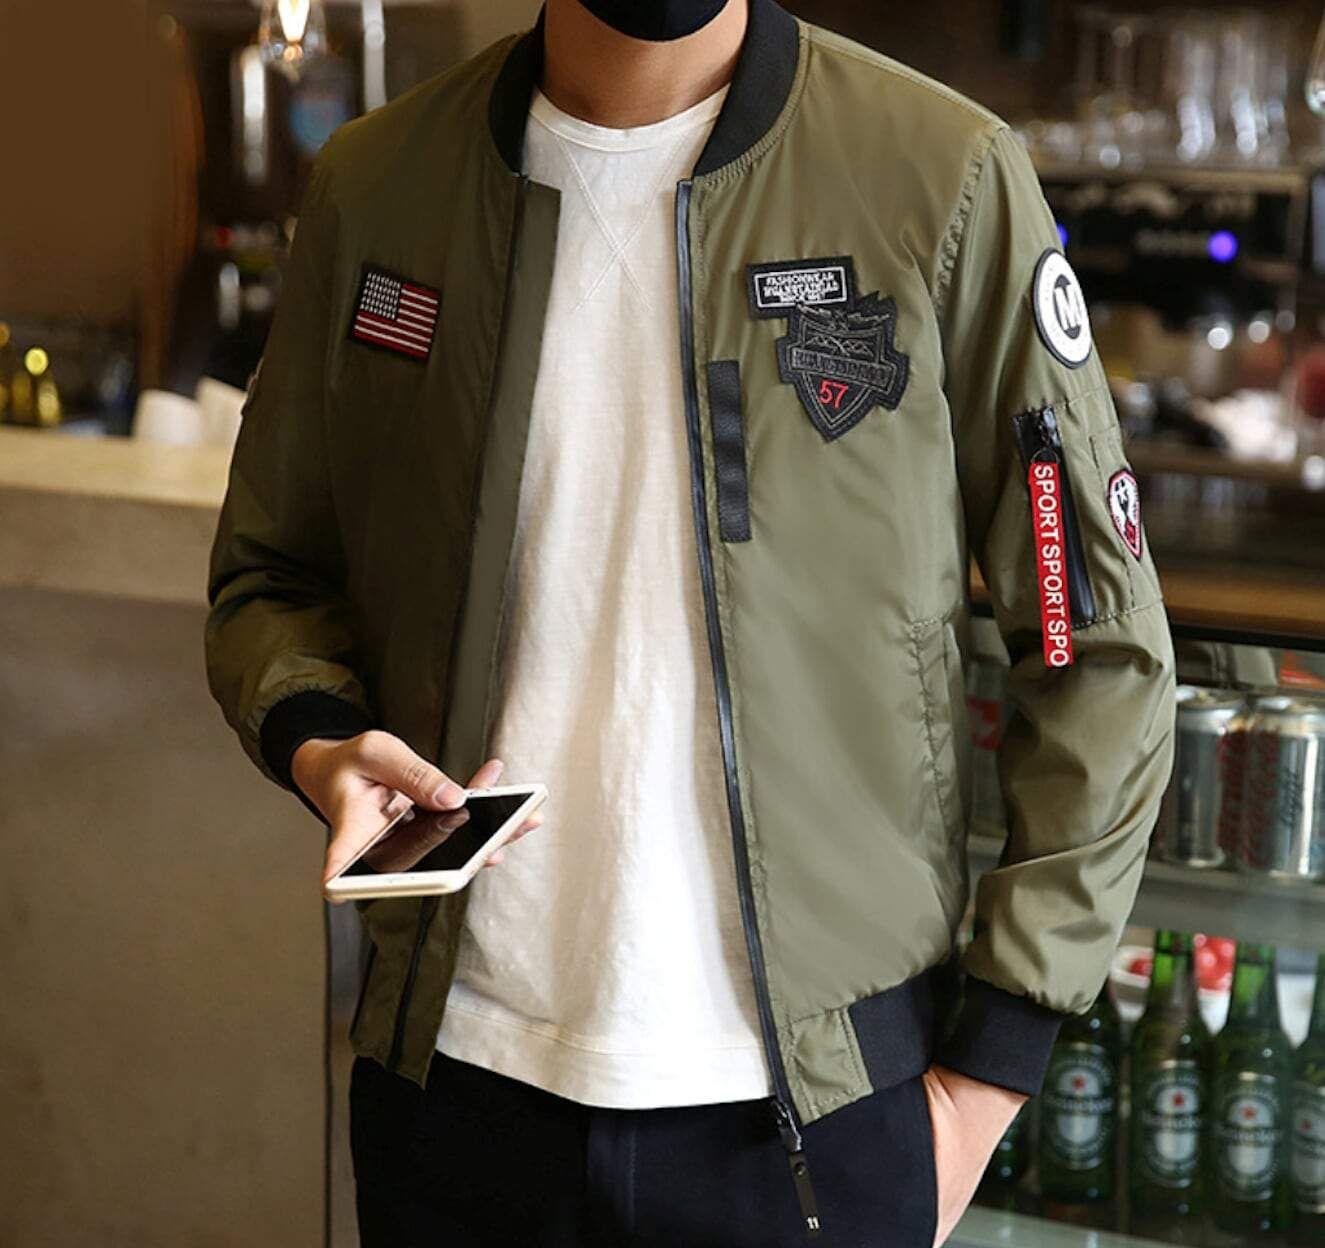 Mens Zip Up Bomber Jacket In 2021 Bomber Jacket Bomber Jacket Men Jackets Men Fashion [ 1248 x 1325 Pixel ]